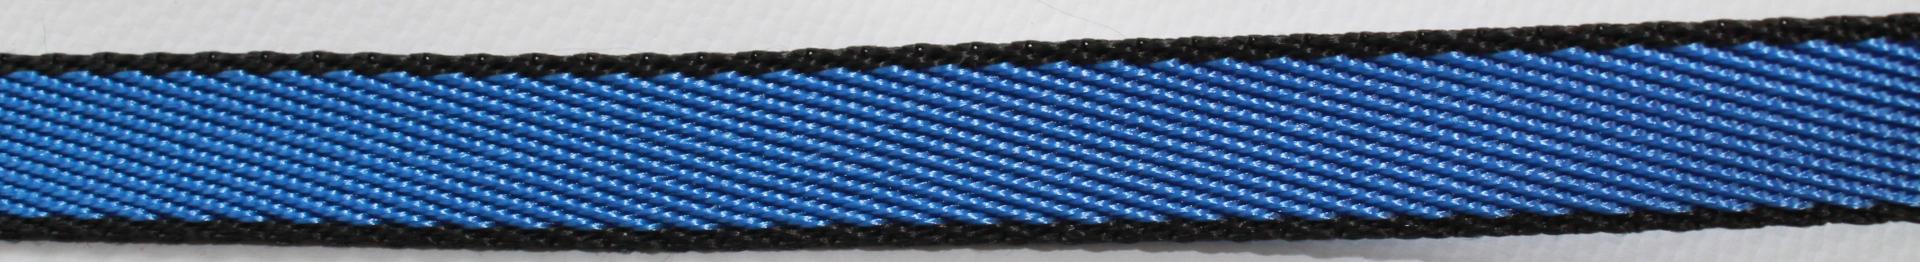 Поводок для собак Happy Friends, цвет: синий, ширина 1 см, длина 1,20 м поводок для собак happy house luxury цвет темно коричневый длина 125 см